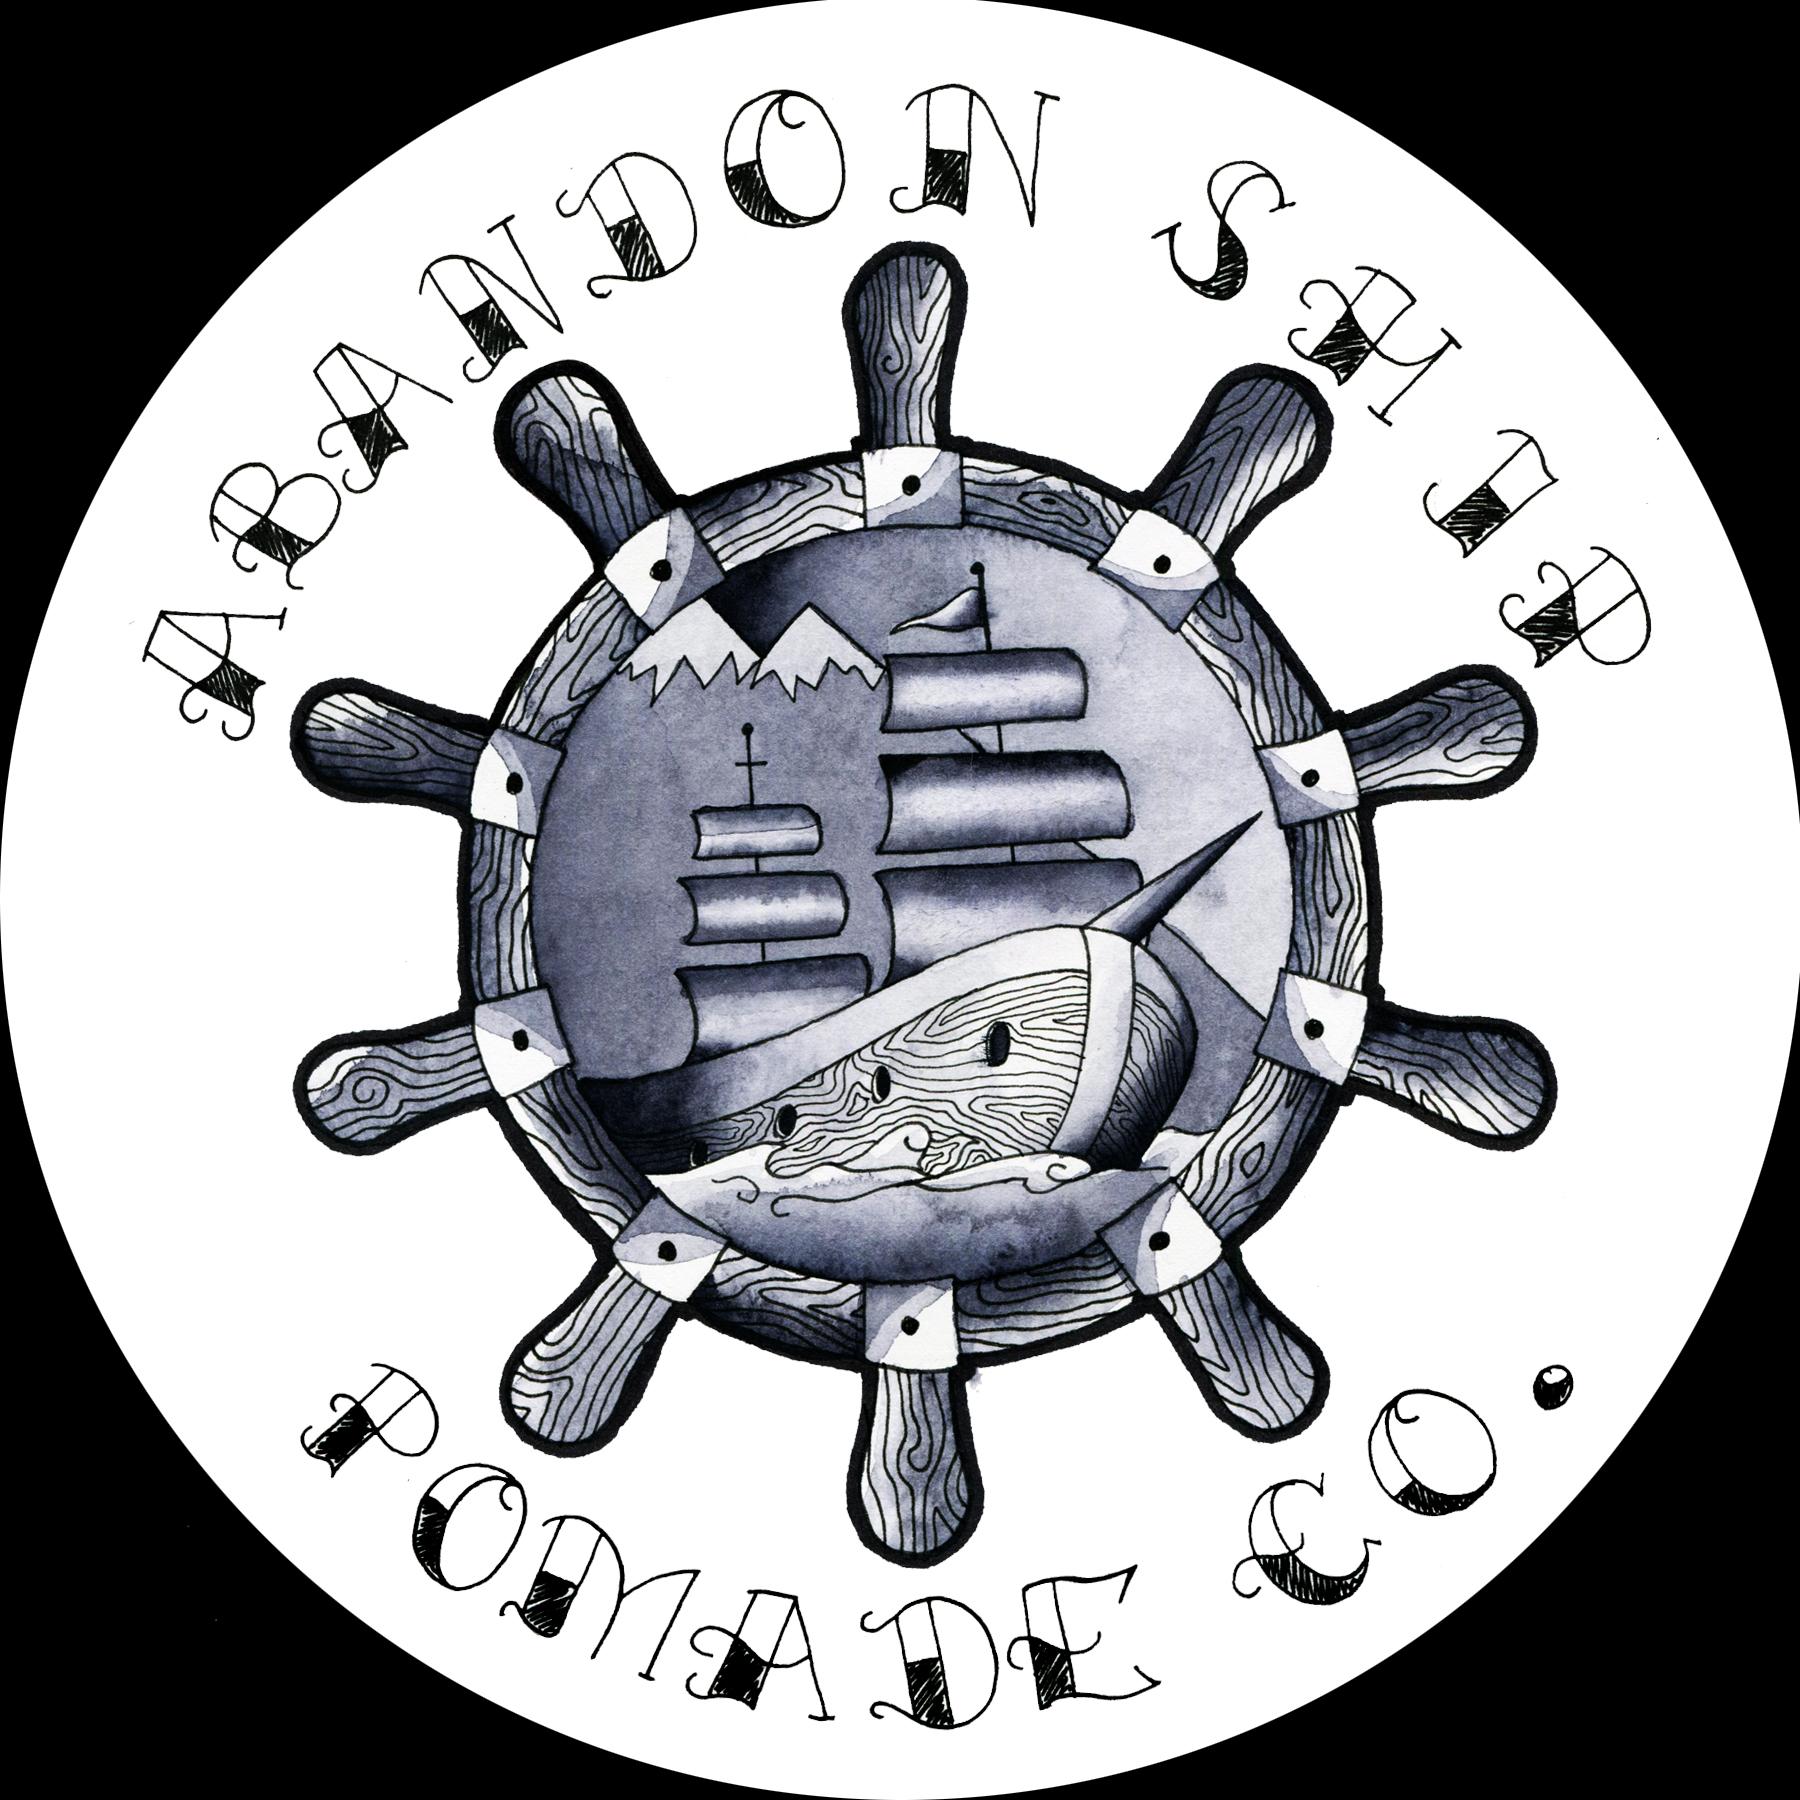 Design for Abandon Ship Pomade Co.